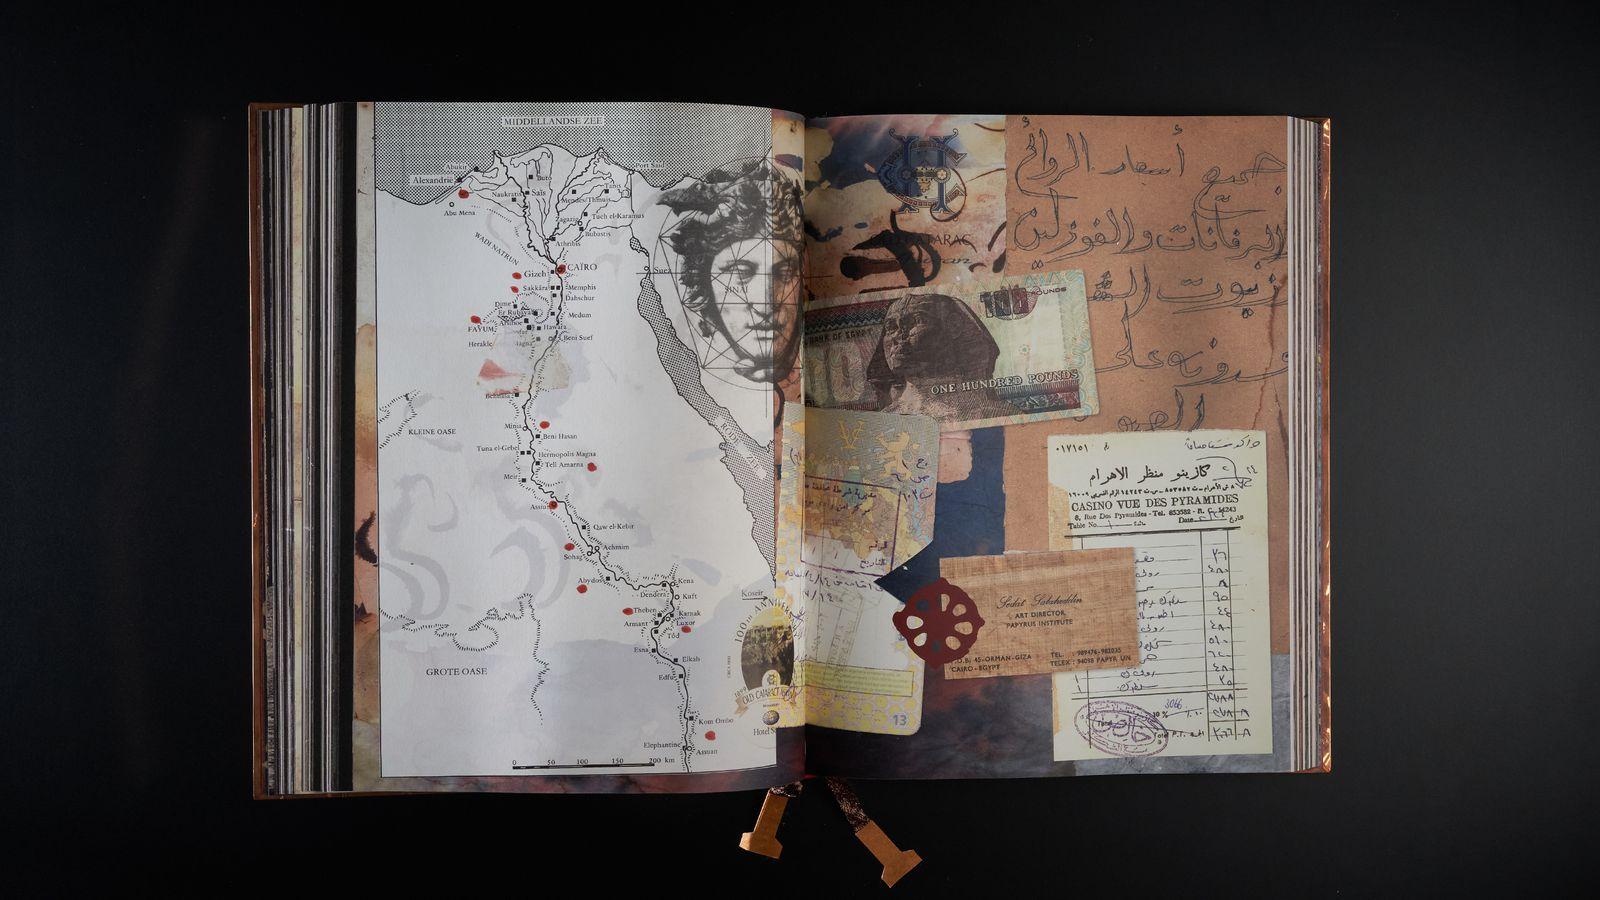 Codex Bierenbroodspot - Spread 3.jpg